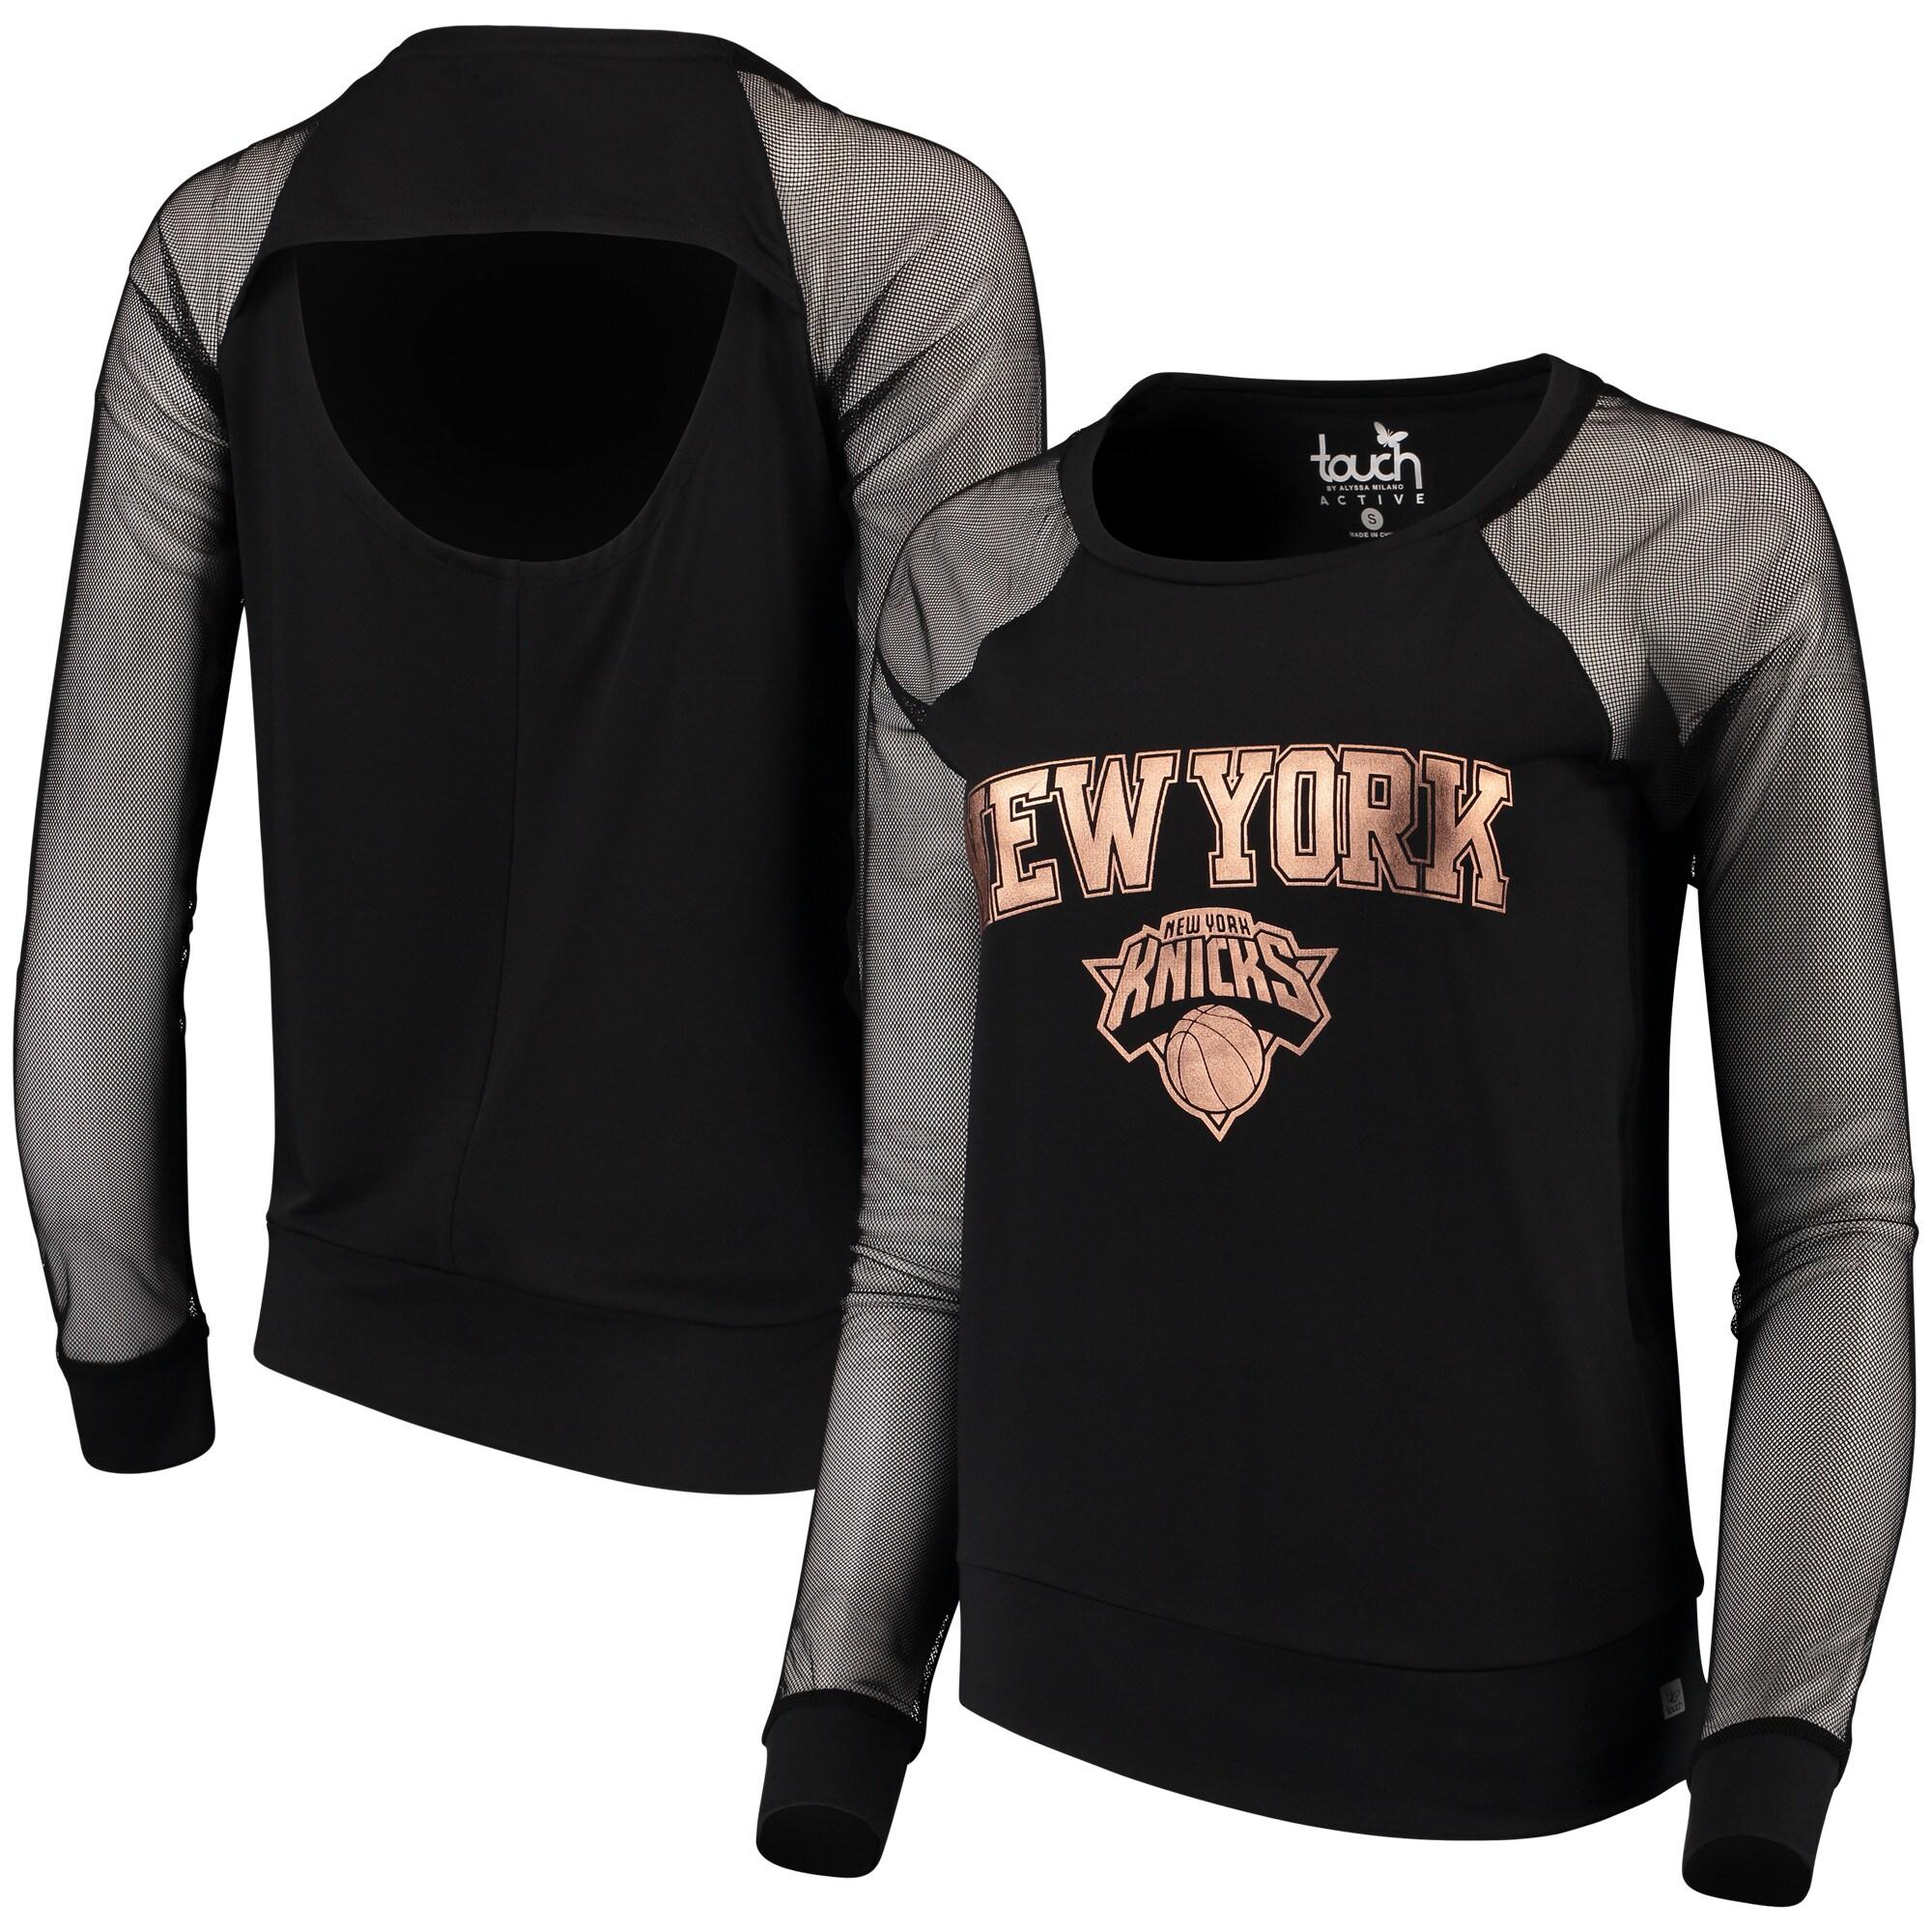 New York Knicks Touch by Alyssa Milano Women's Make the Cut Long Sleeve Top - Black